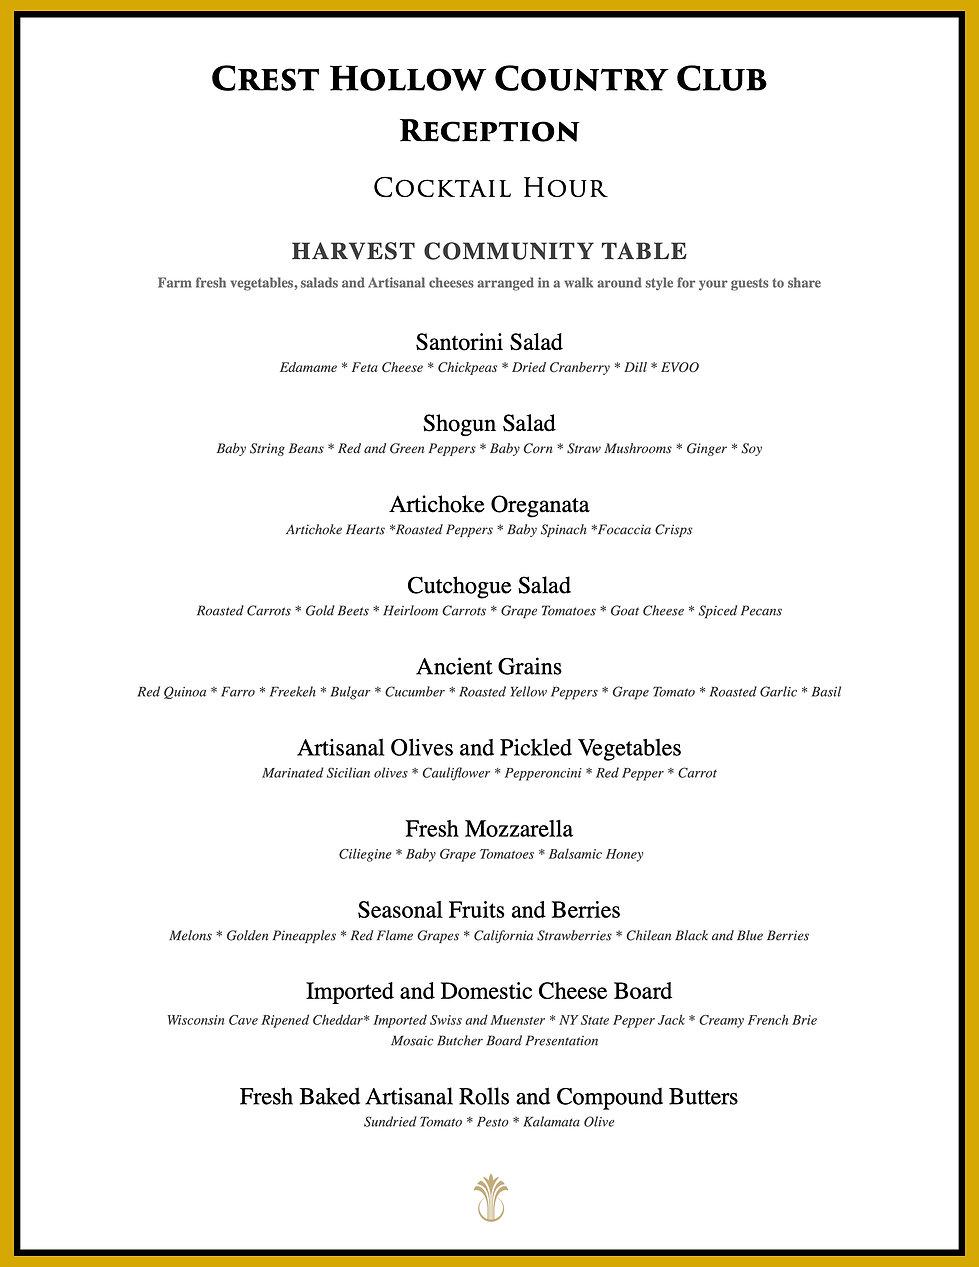 Reception Menu - Page 1.jpg